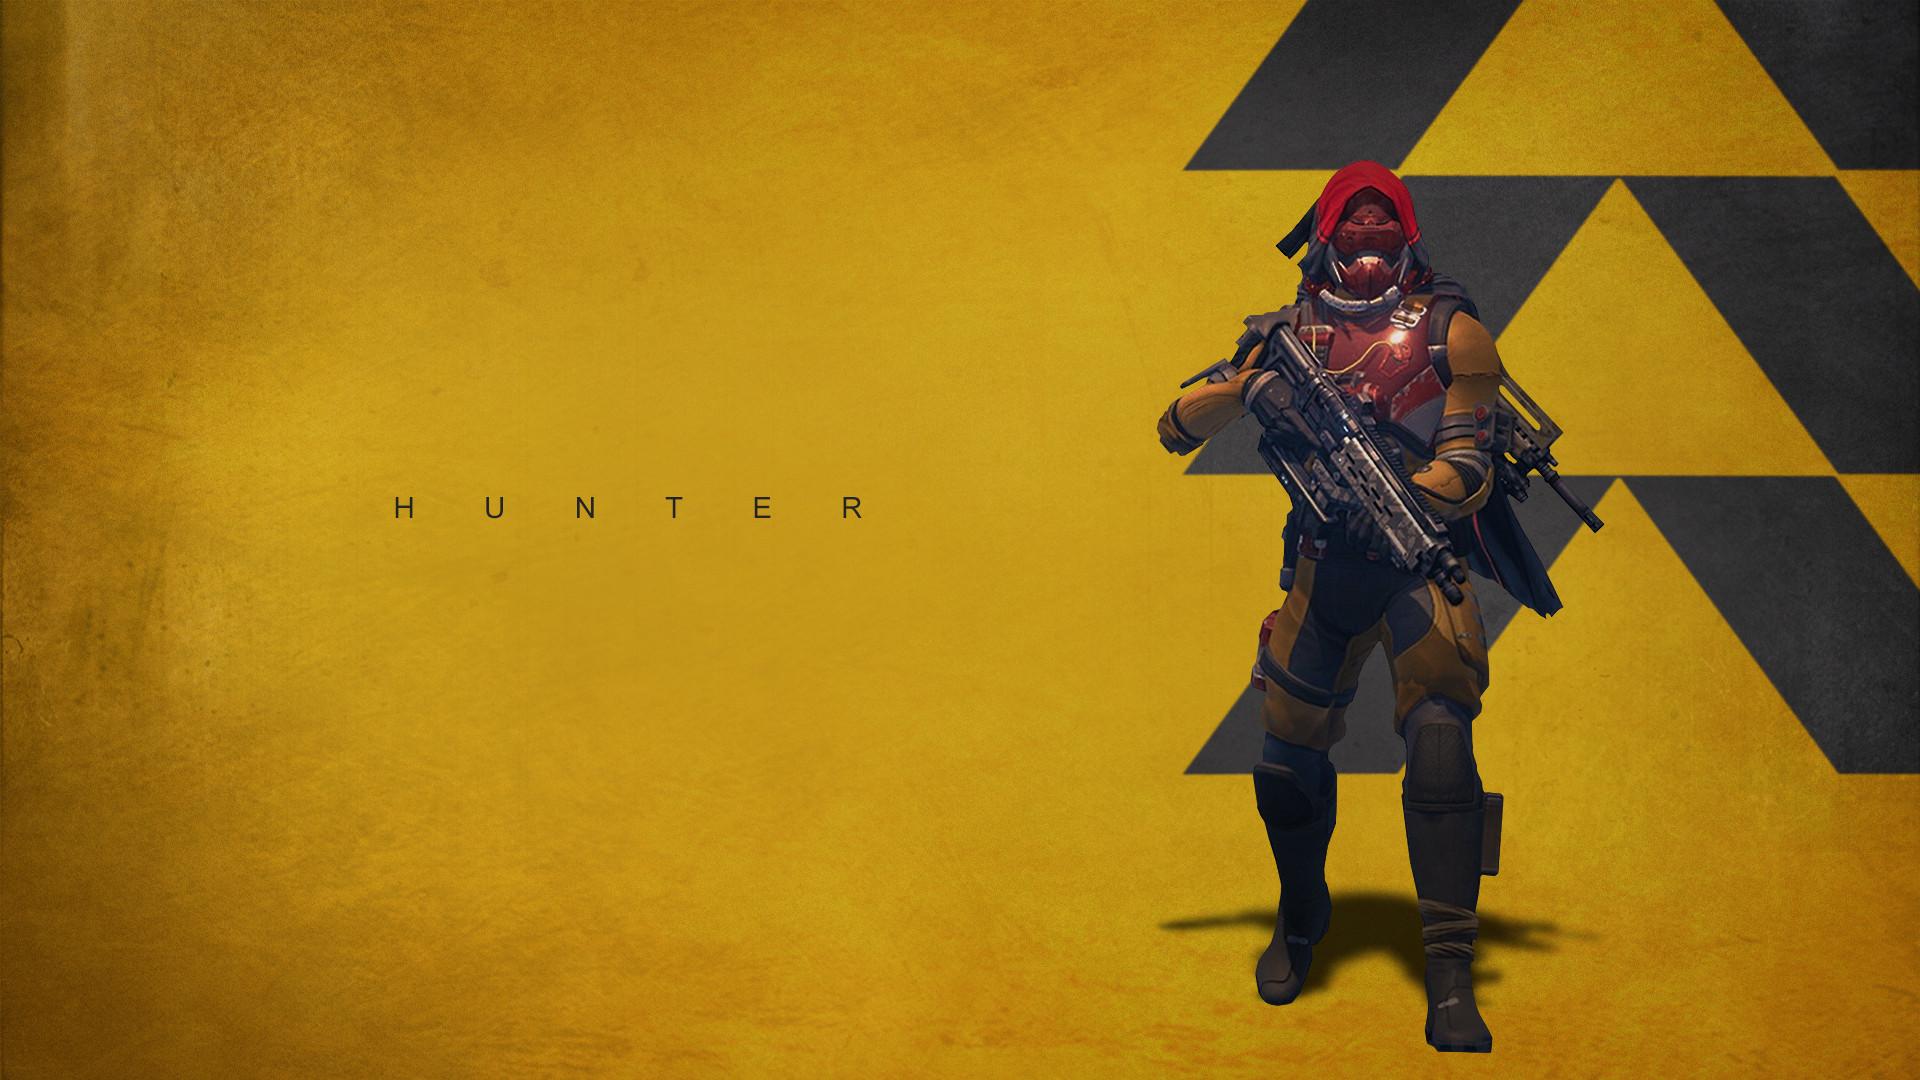 Hunter Wallpaper Destiny (68+ images)